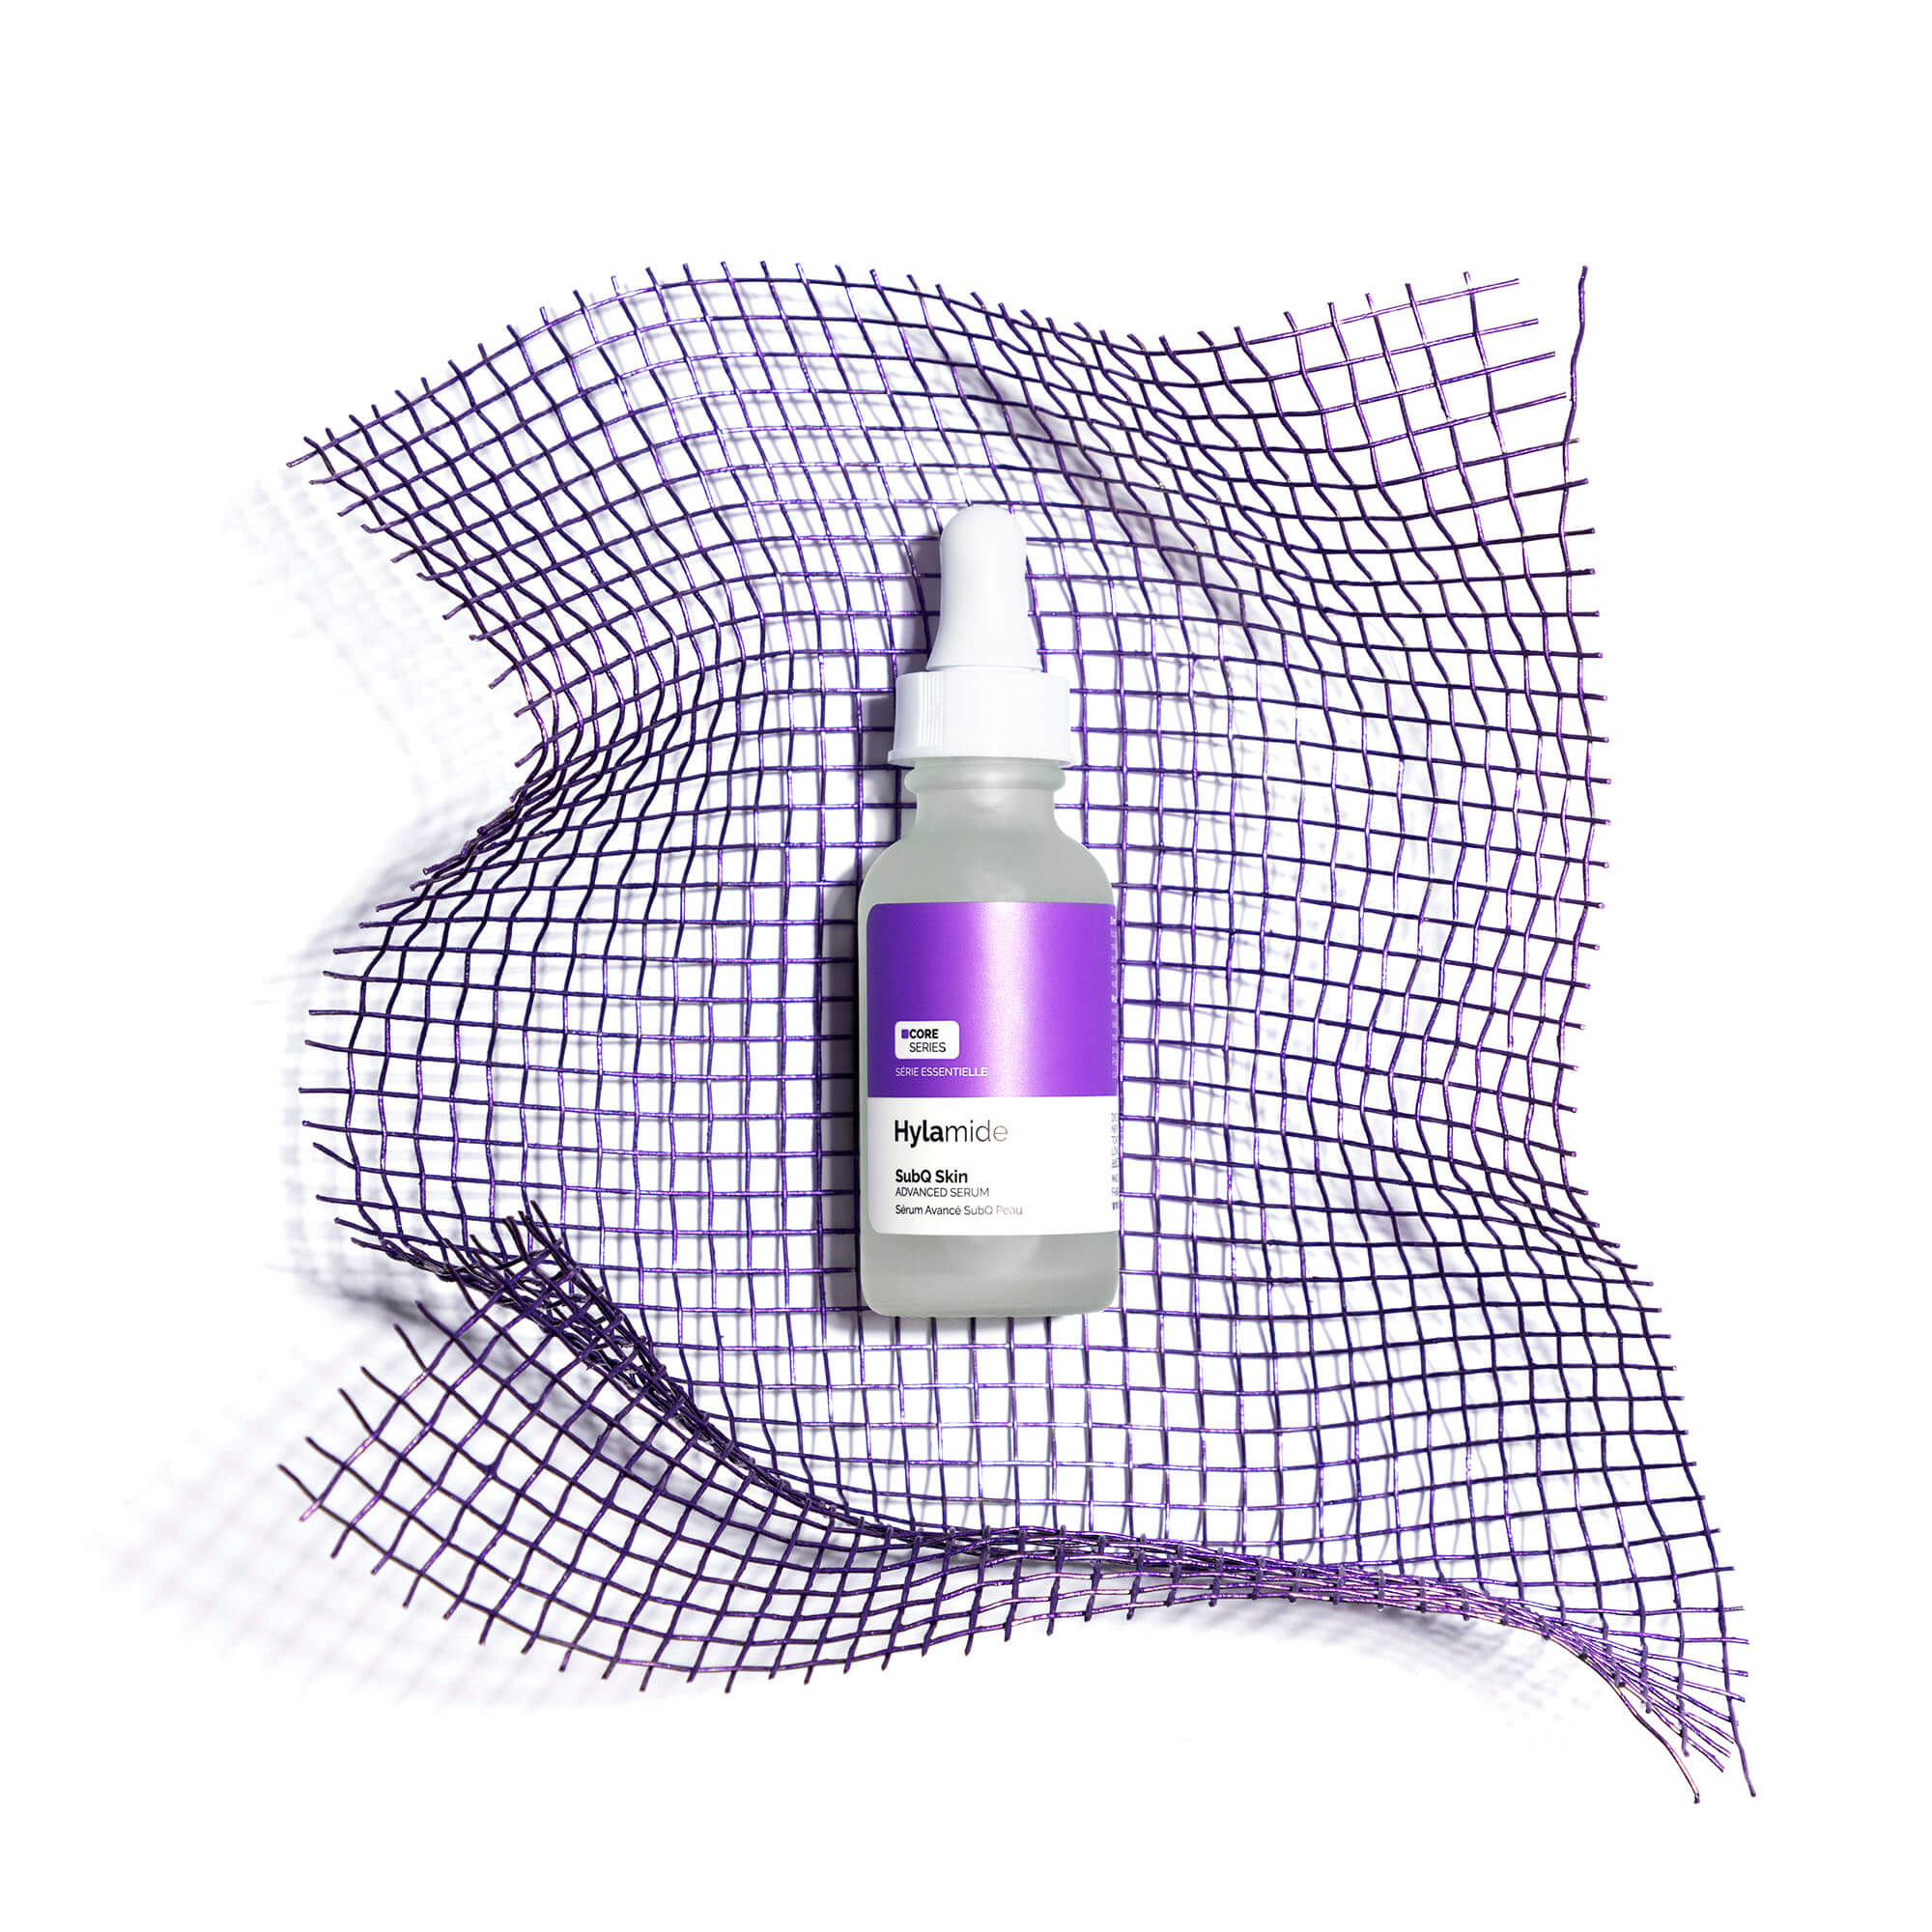 Hylamide SubQ Skin serum bottle against purple netting